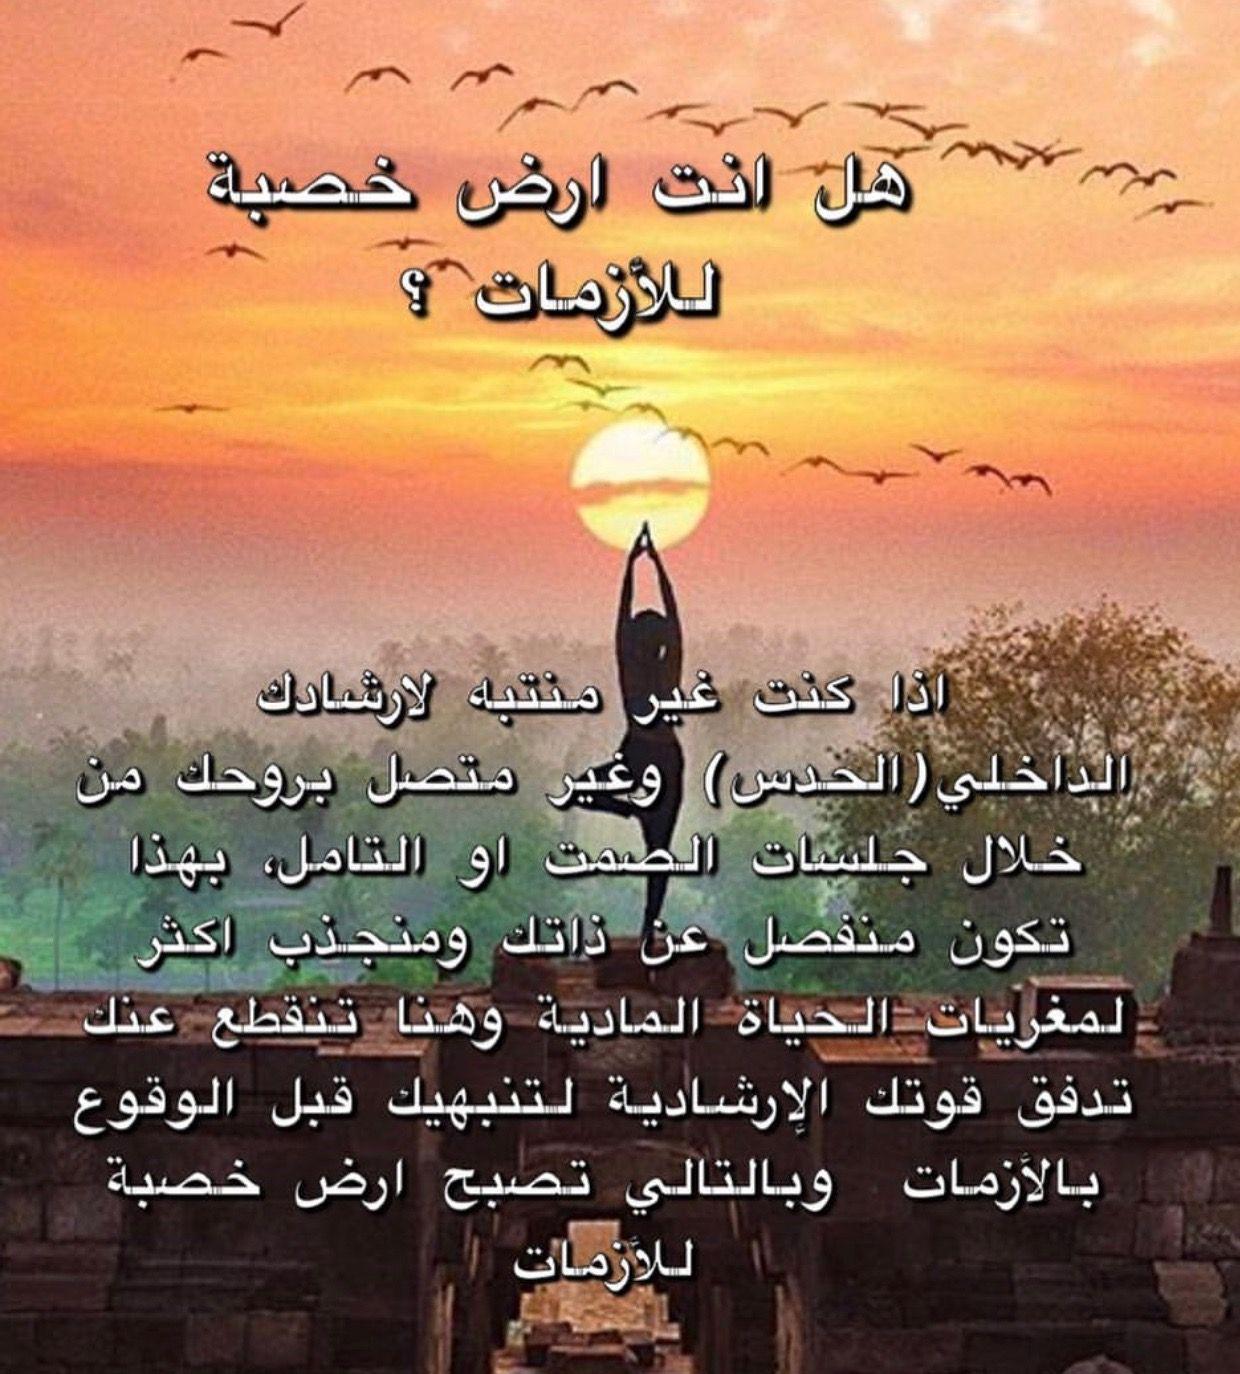 Pin By Tulip Tree On تطوير الذات Meditation Movie Posters Poster